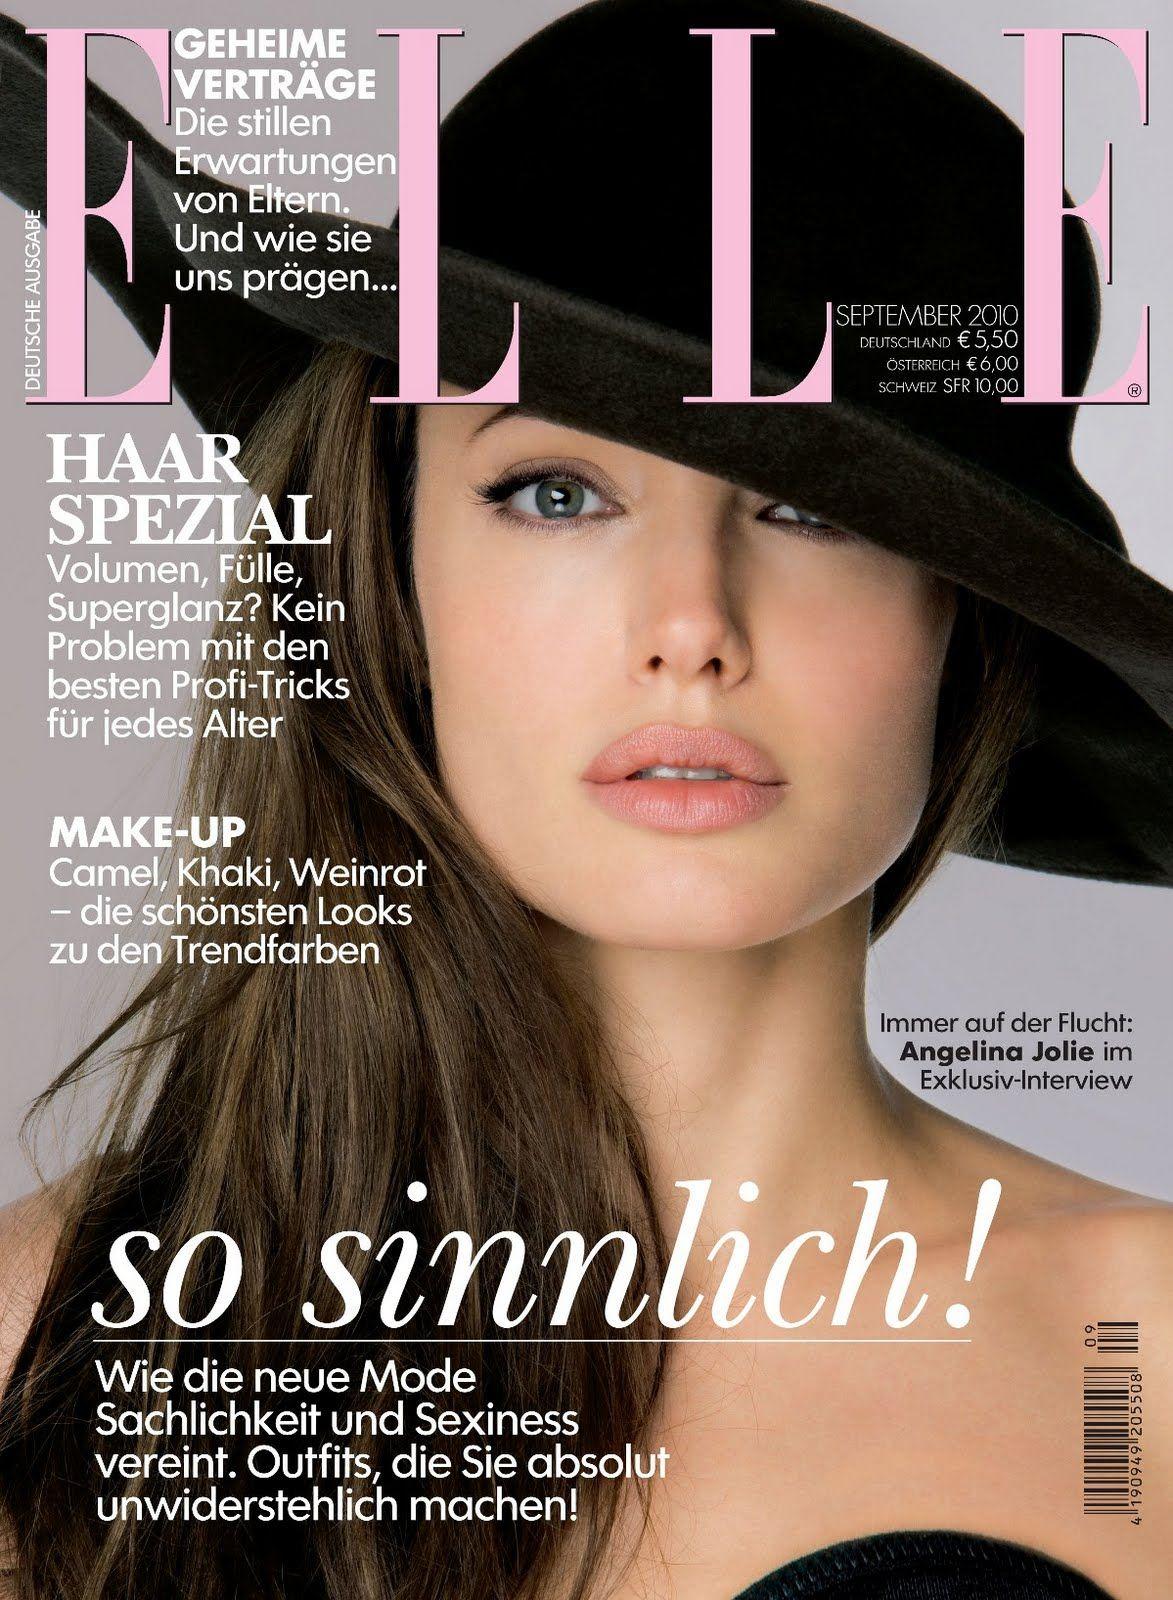 Jolie Magazine November 2017 Issue: Pin By Iria Gonzalez On Angelina Jolie